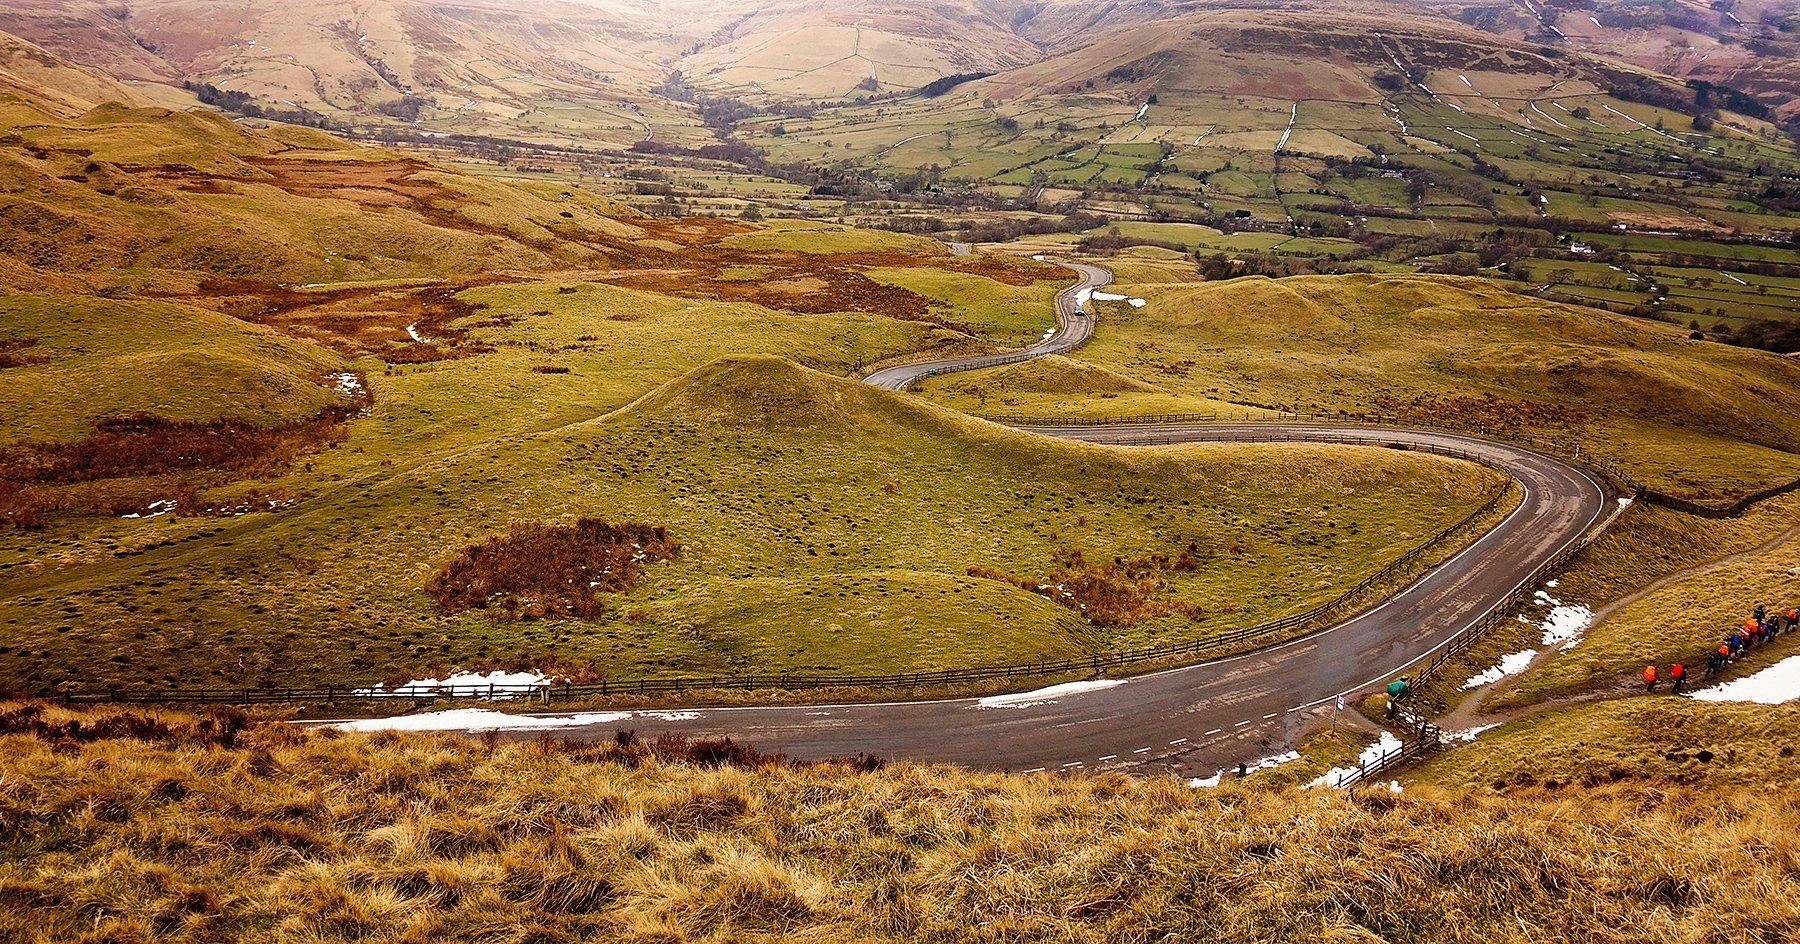 Circular Mam Tor and the Great Ridge Walk